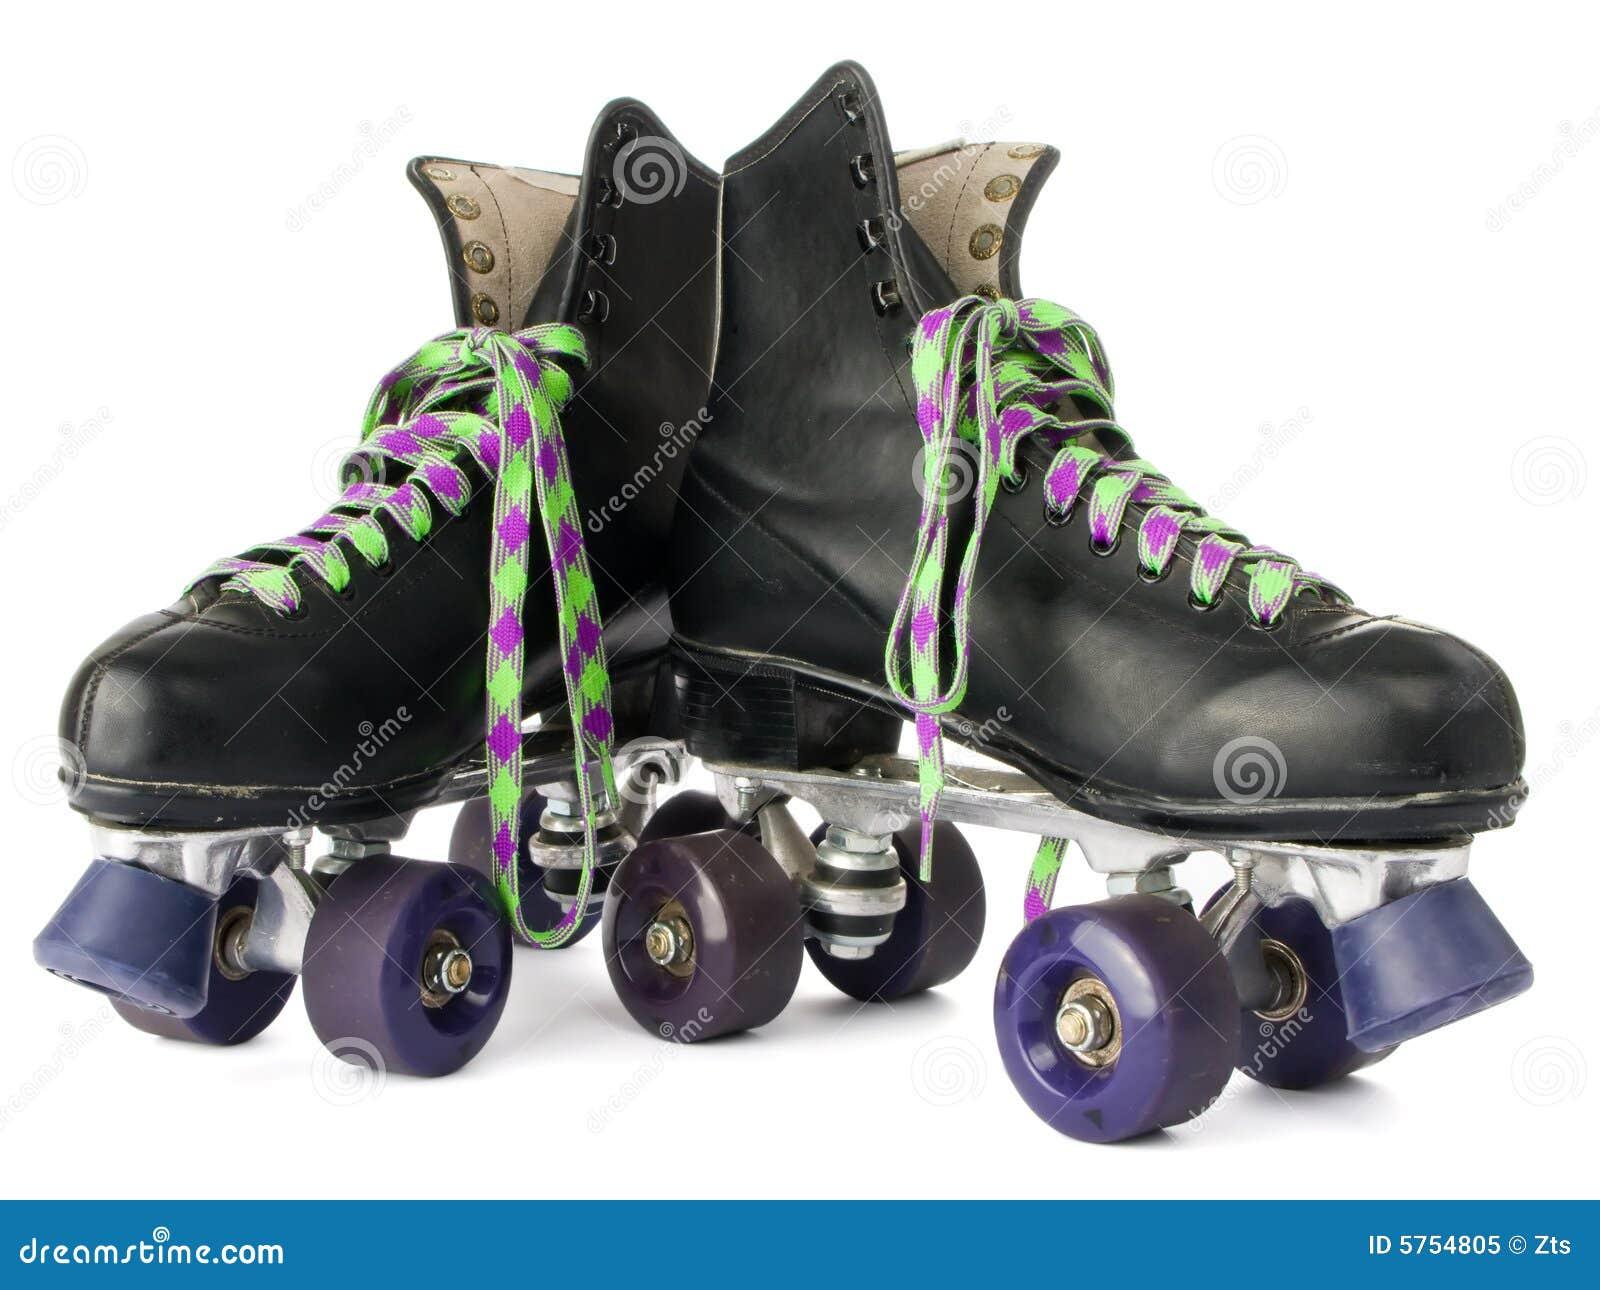 Roller skates for free - Retro Roller Skates Royalty Free Stock Photo